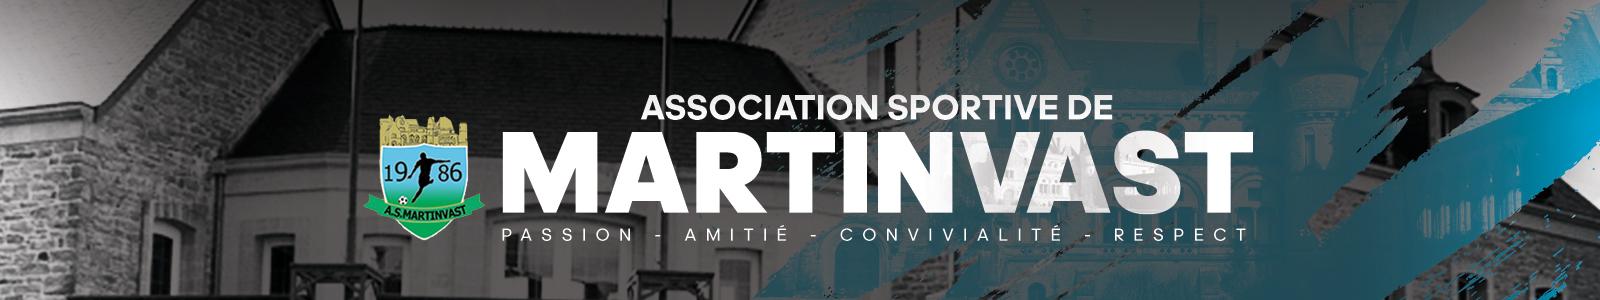 Association Sportive de MARTINVAST : site officiel du club de foot de martinvast - footeo